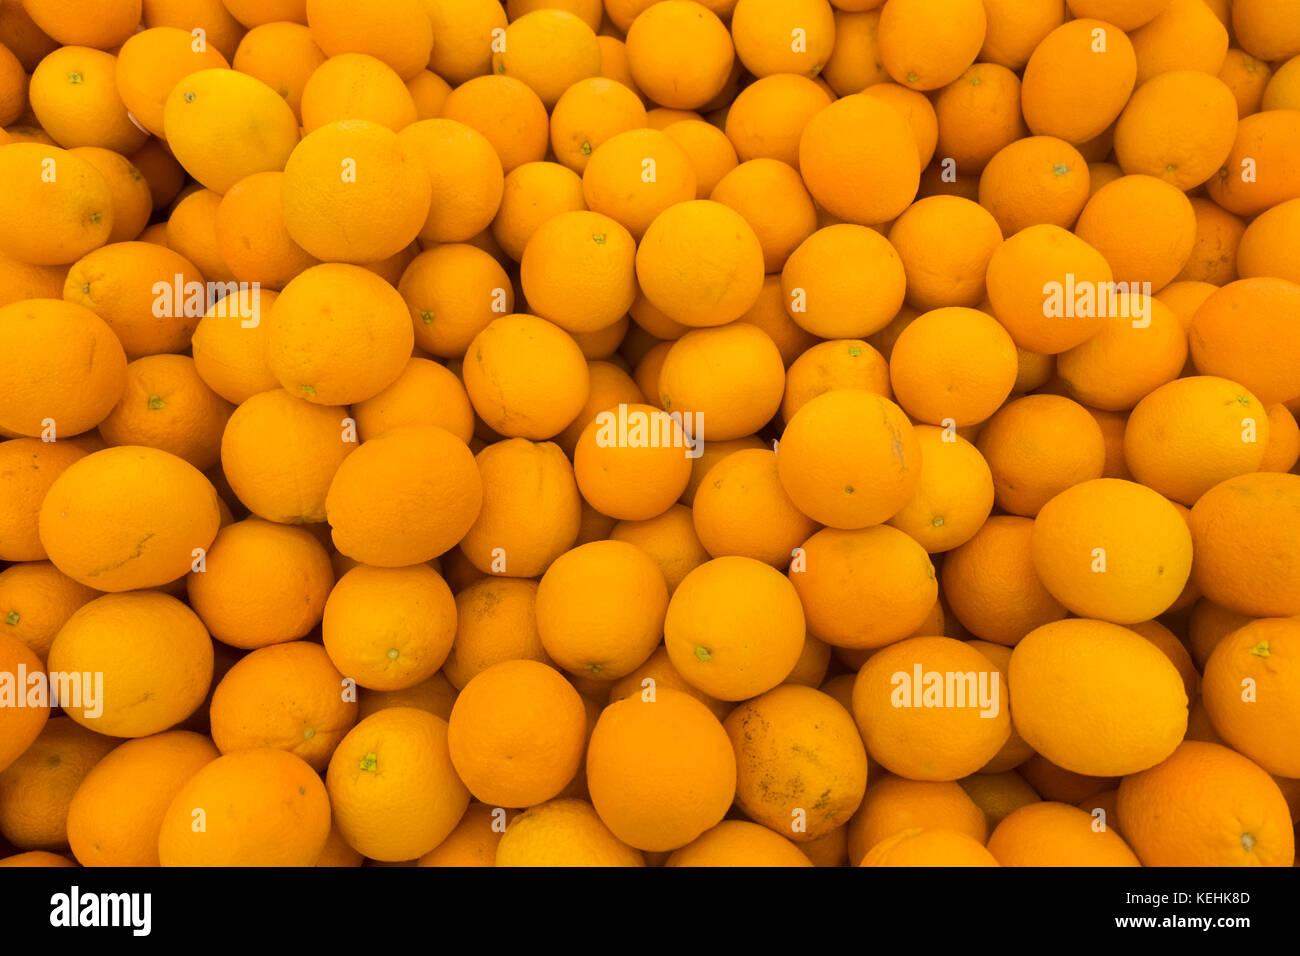 Stapel von Orangen Stockbild